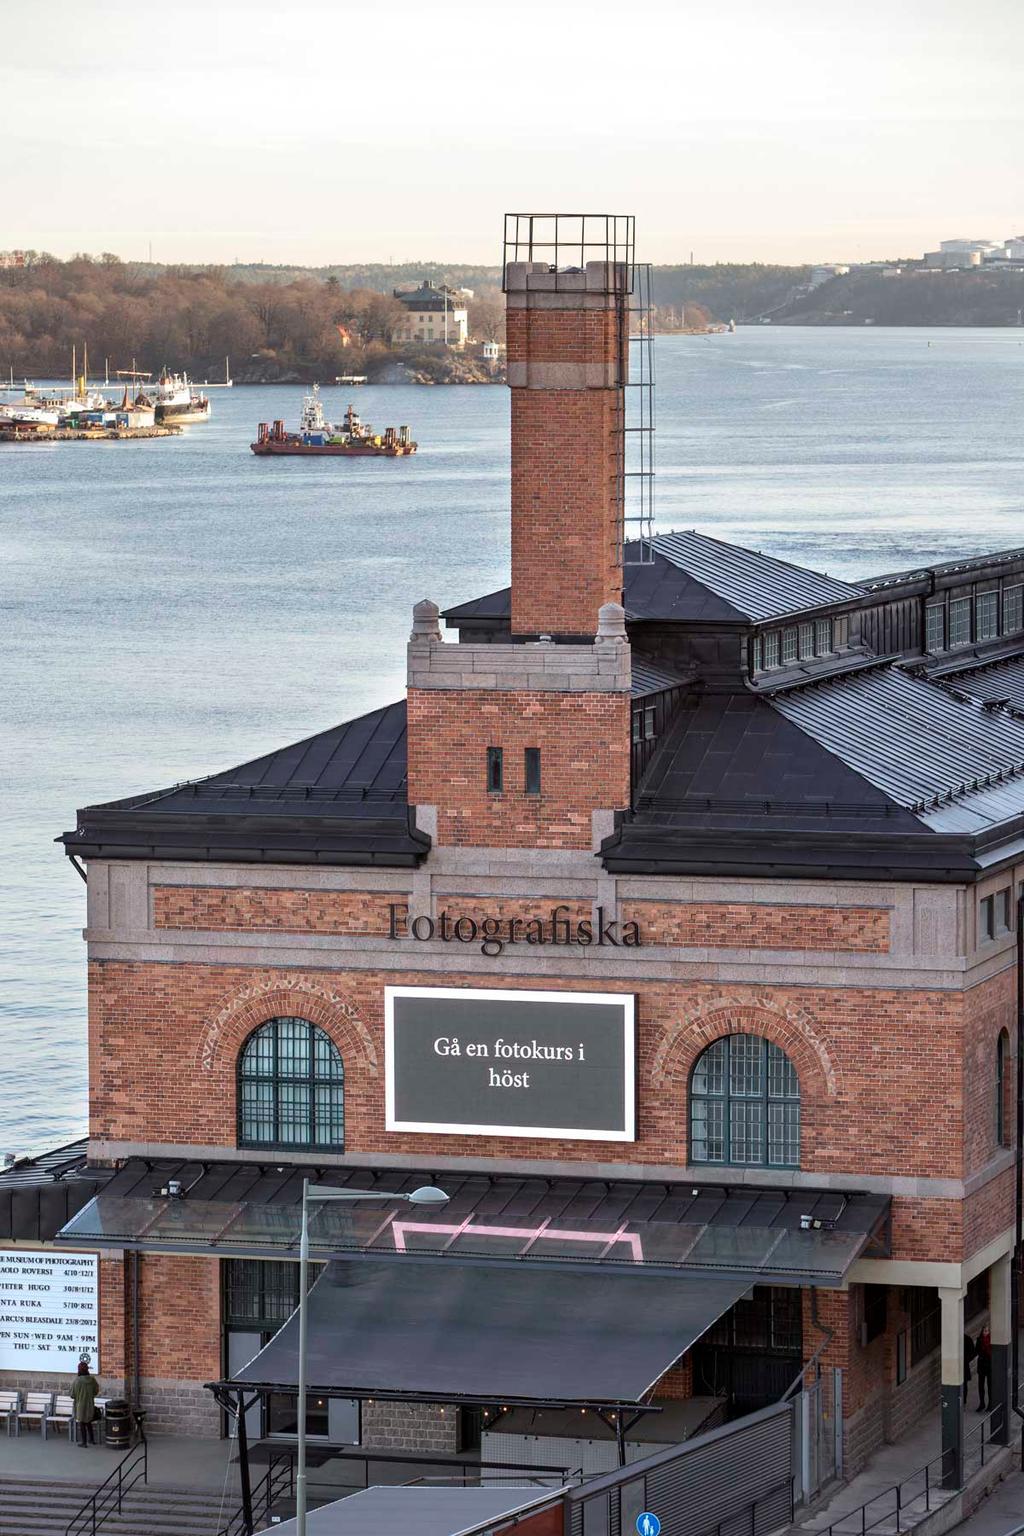 Museum Fotografiska in Stockholm